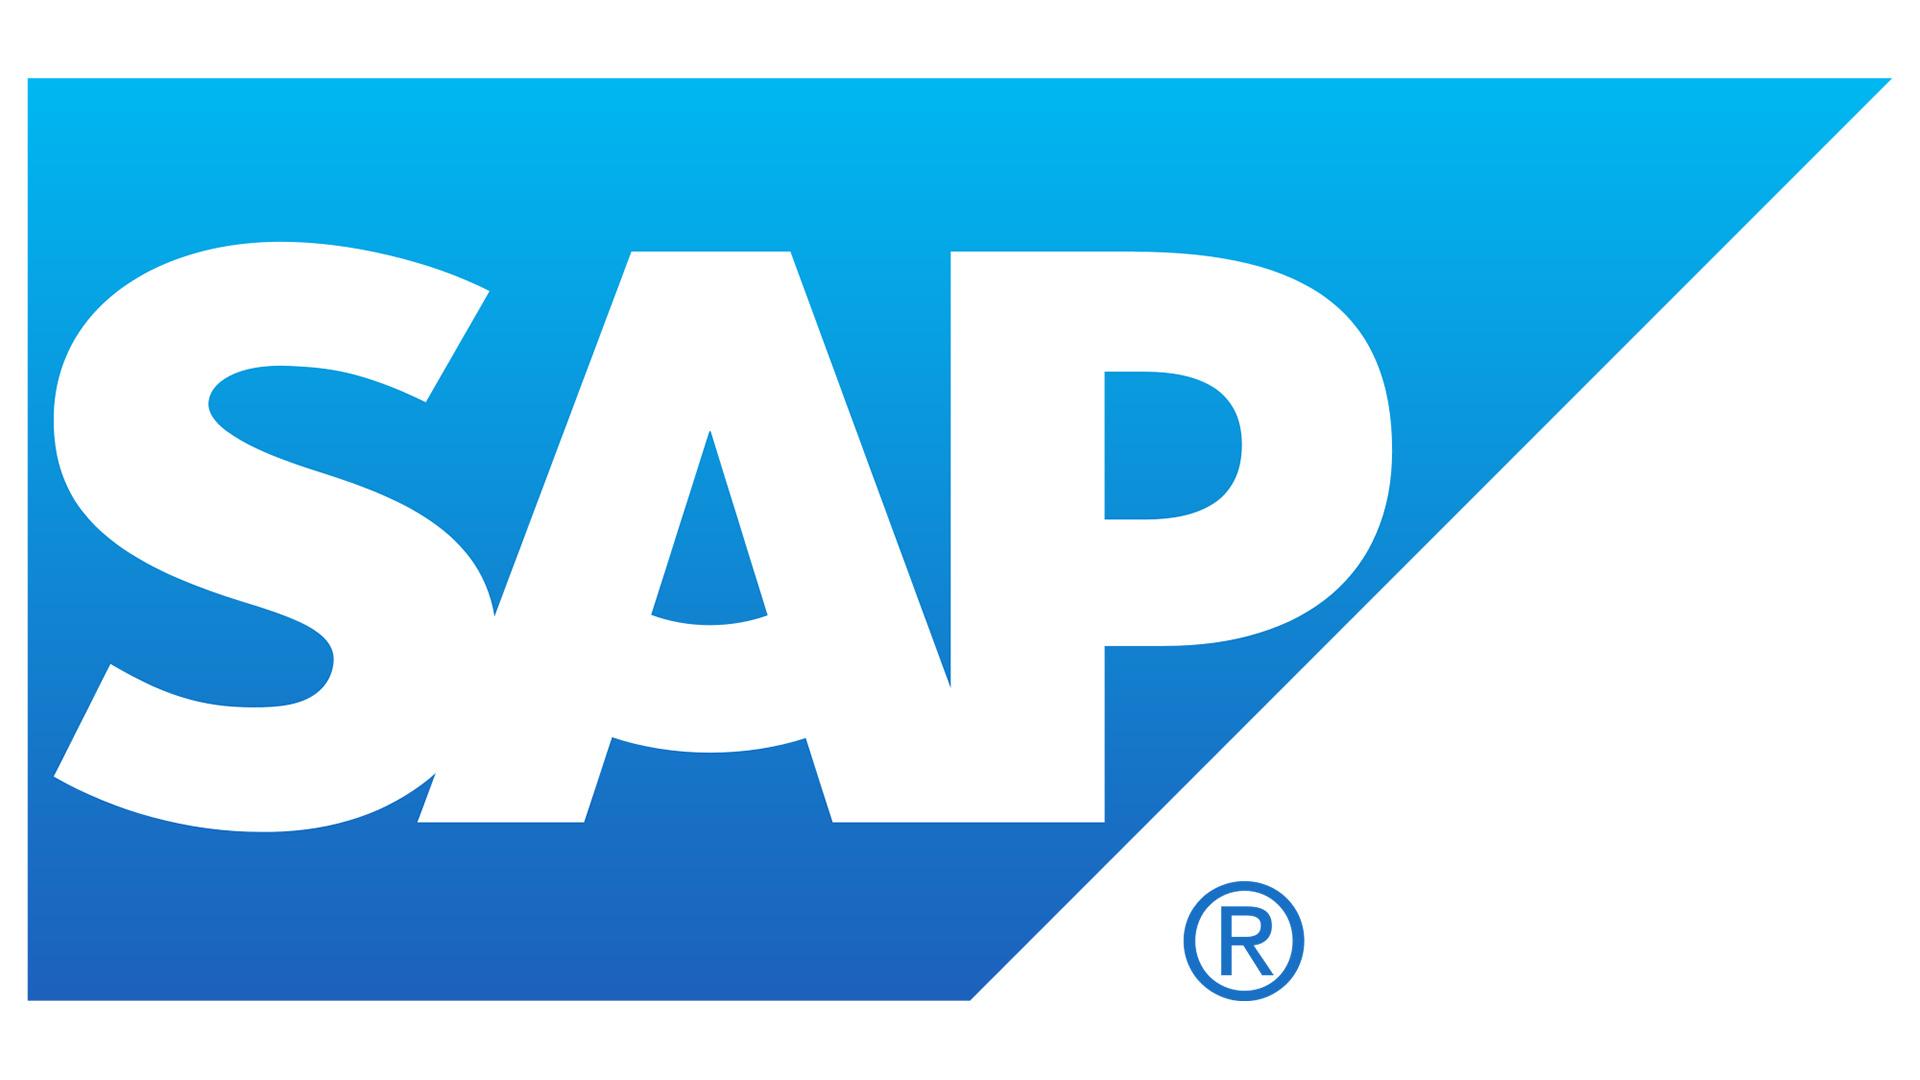 SAP Logo wallpaper 2018 in Brands Logos 1920x1080